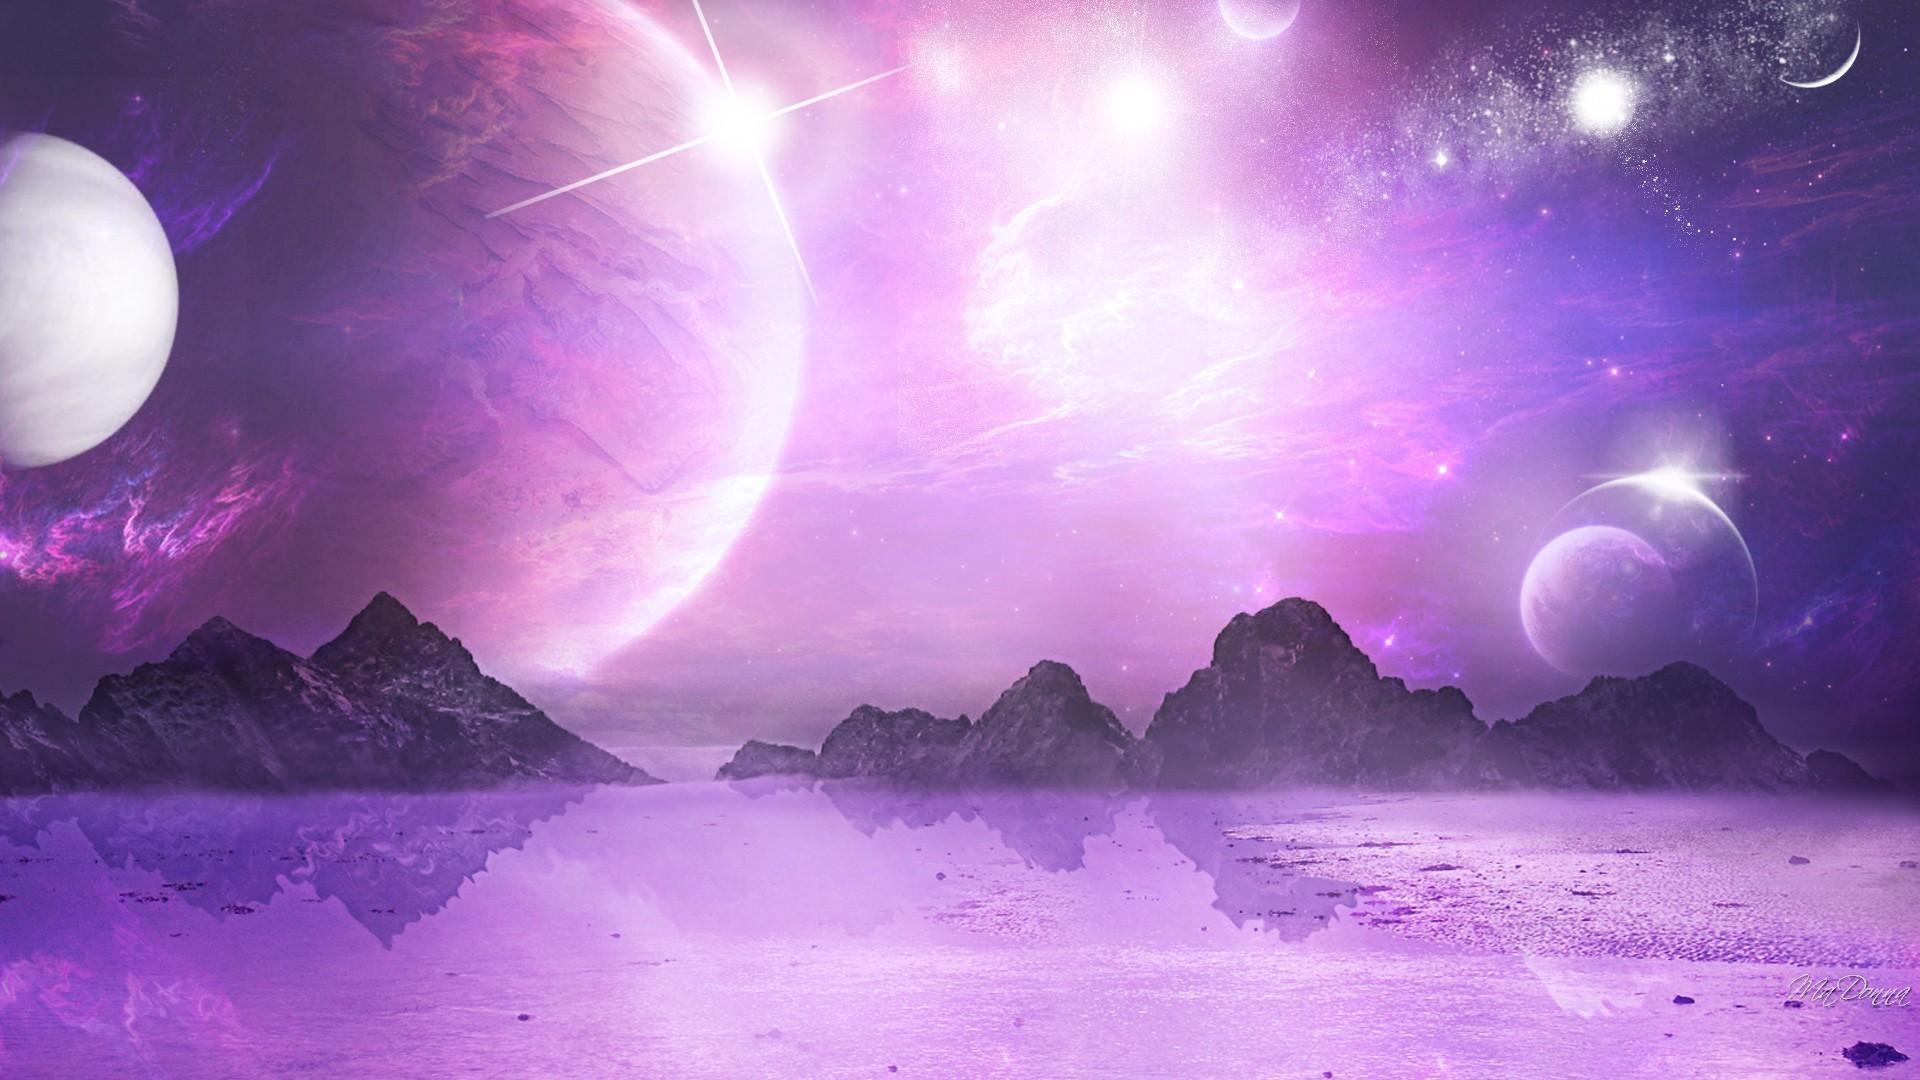 Purple Wallpaper For Phones: Cute Purple Wallpapers (65+ Images